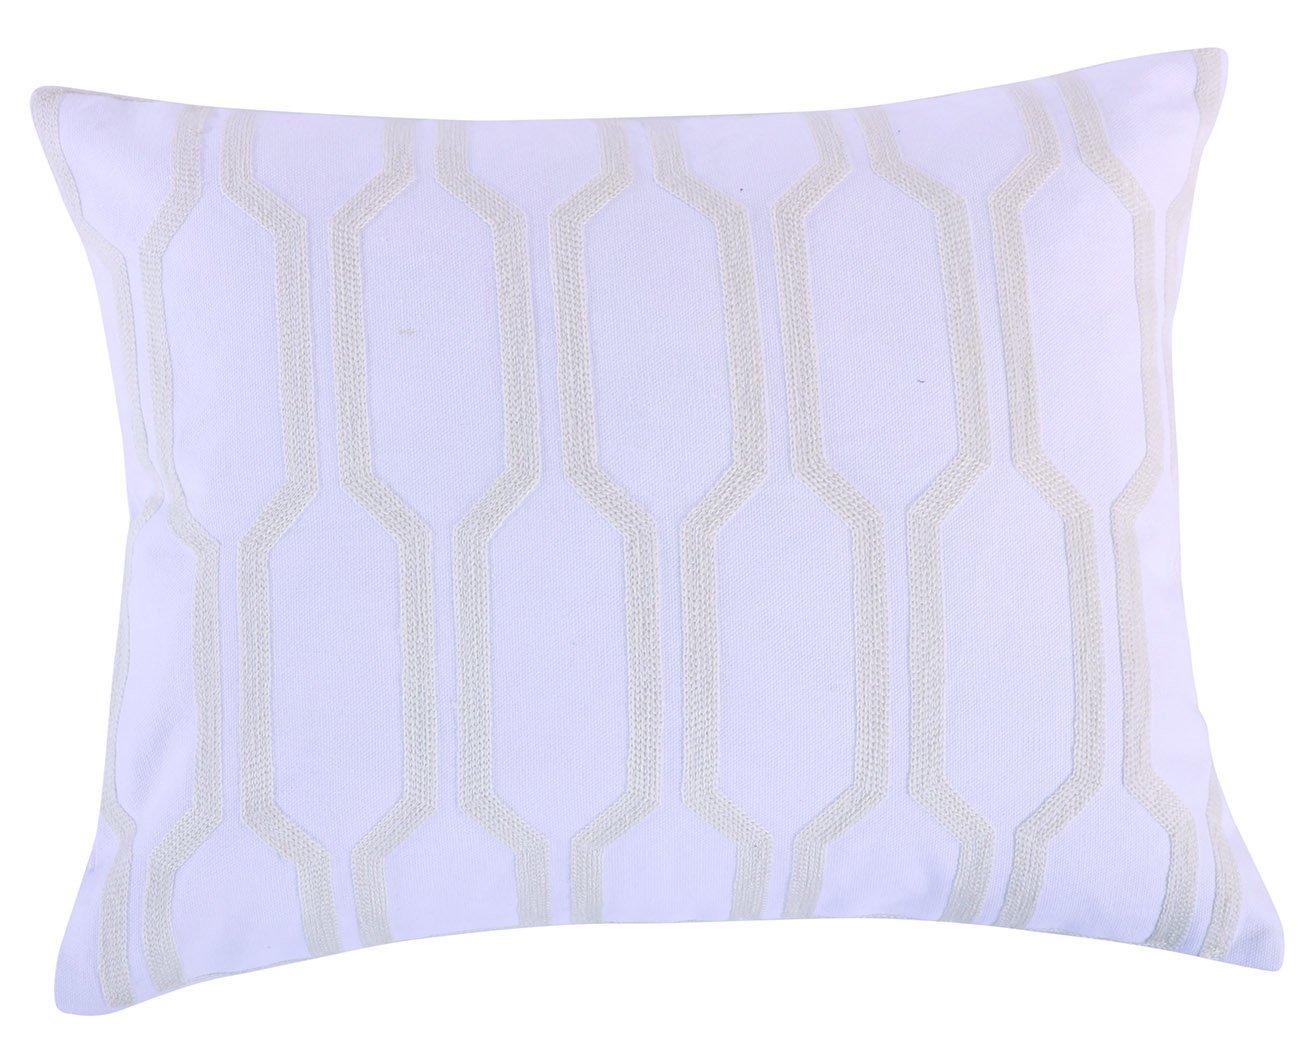 Levtex Spruce Spa Crewel Pillow, White